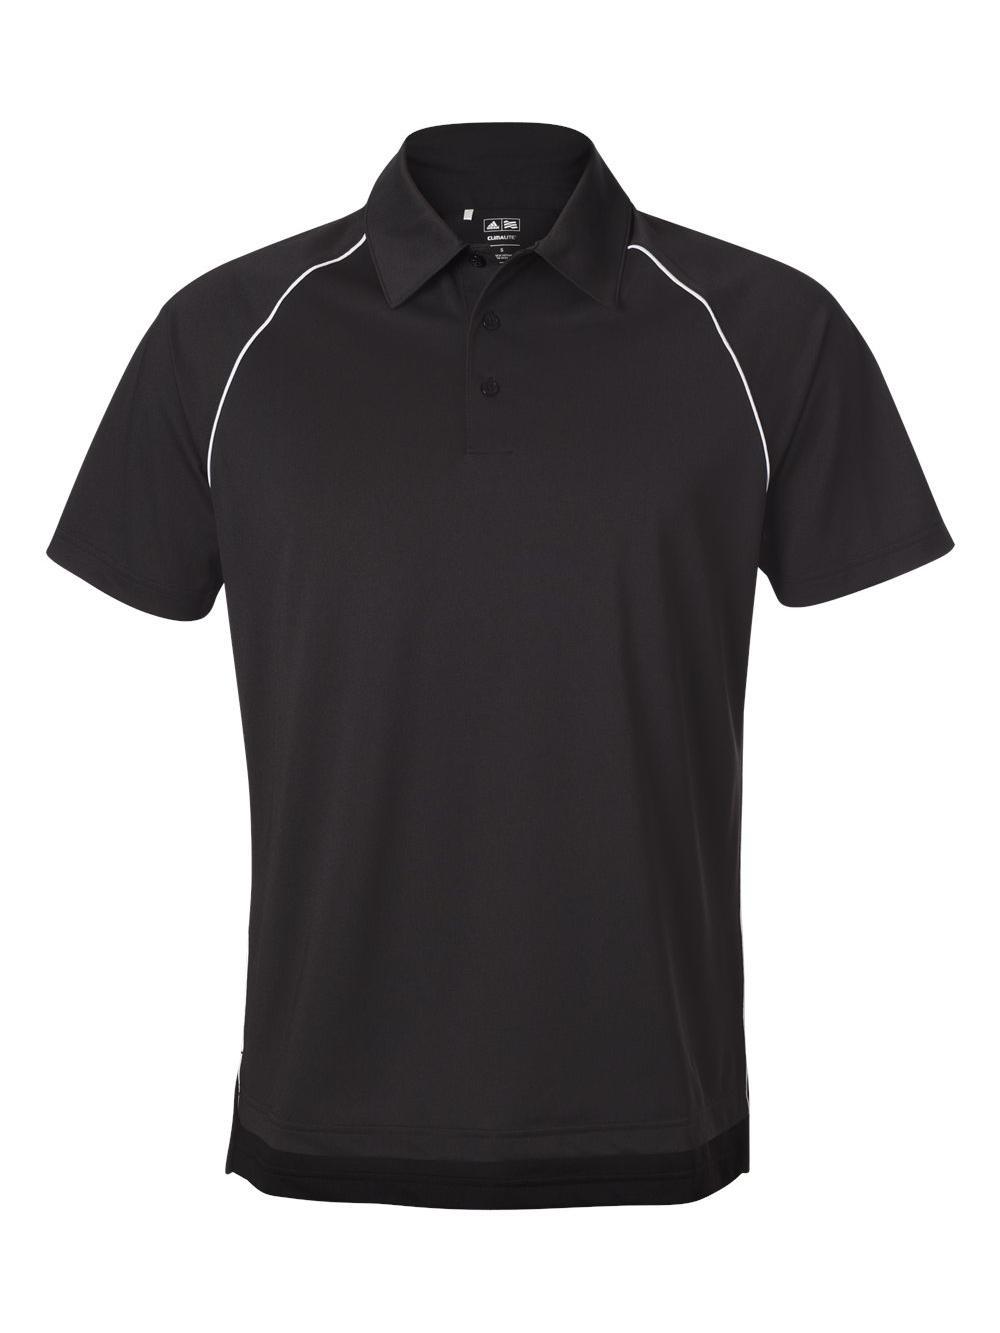 Adidas-Golf-ClimaLite-Piped-Polo-A82 thumbnail 3